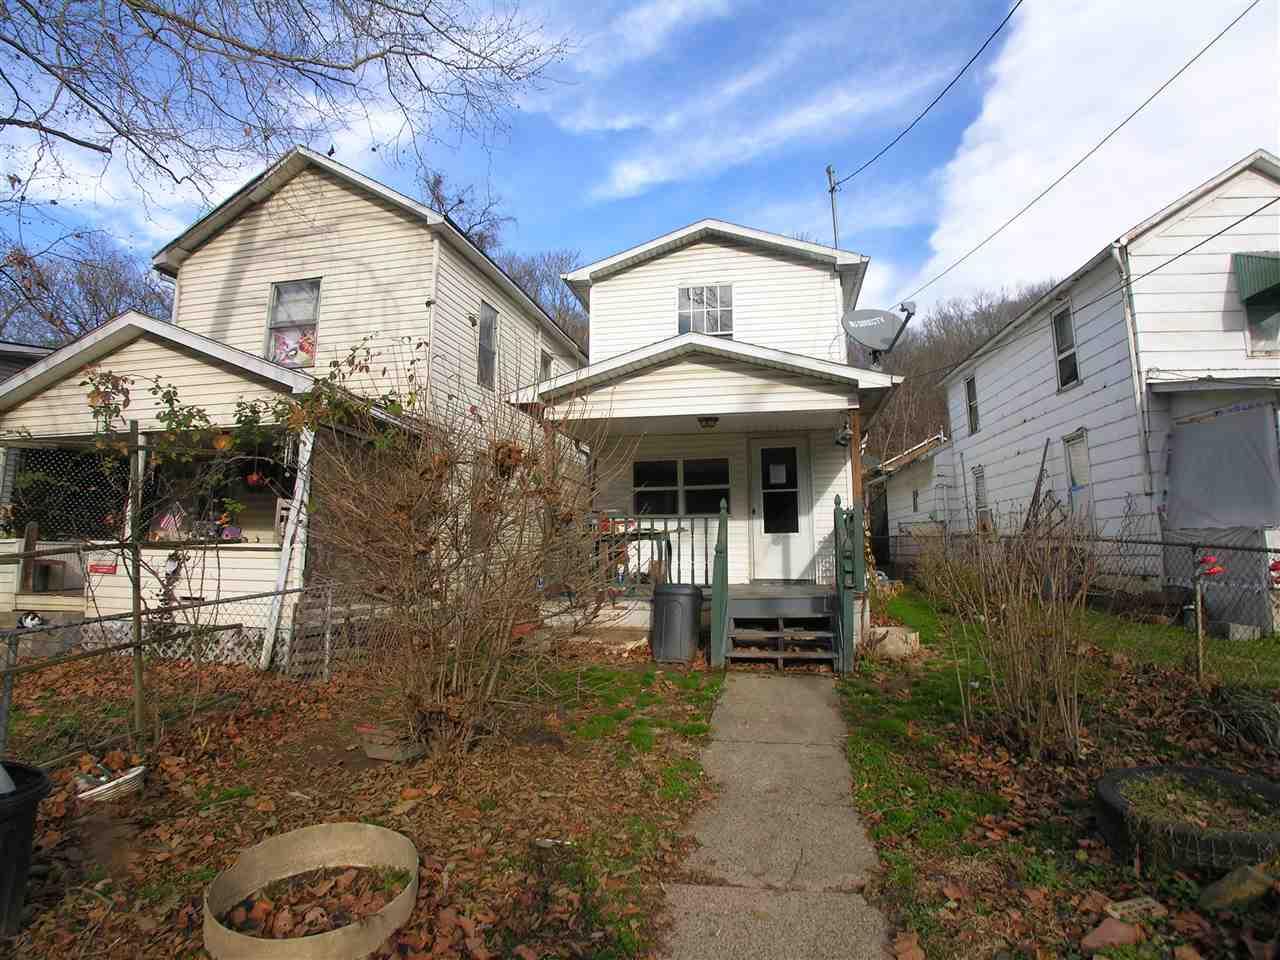 954 28th St, Huntington, WV 25705 | RealEstate.com